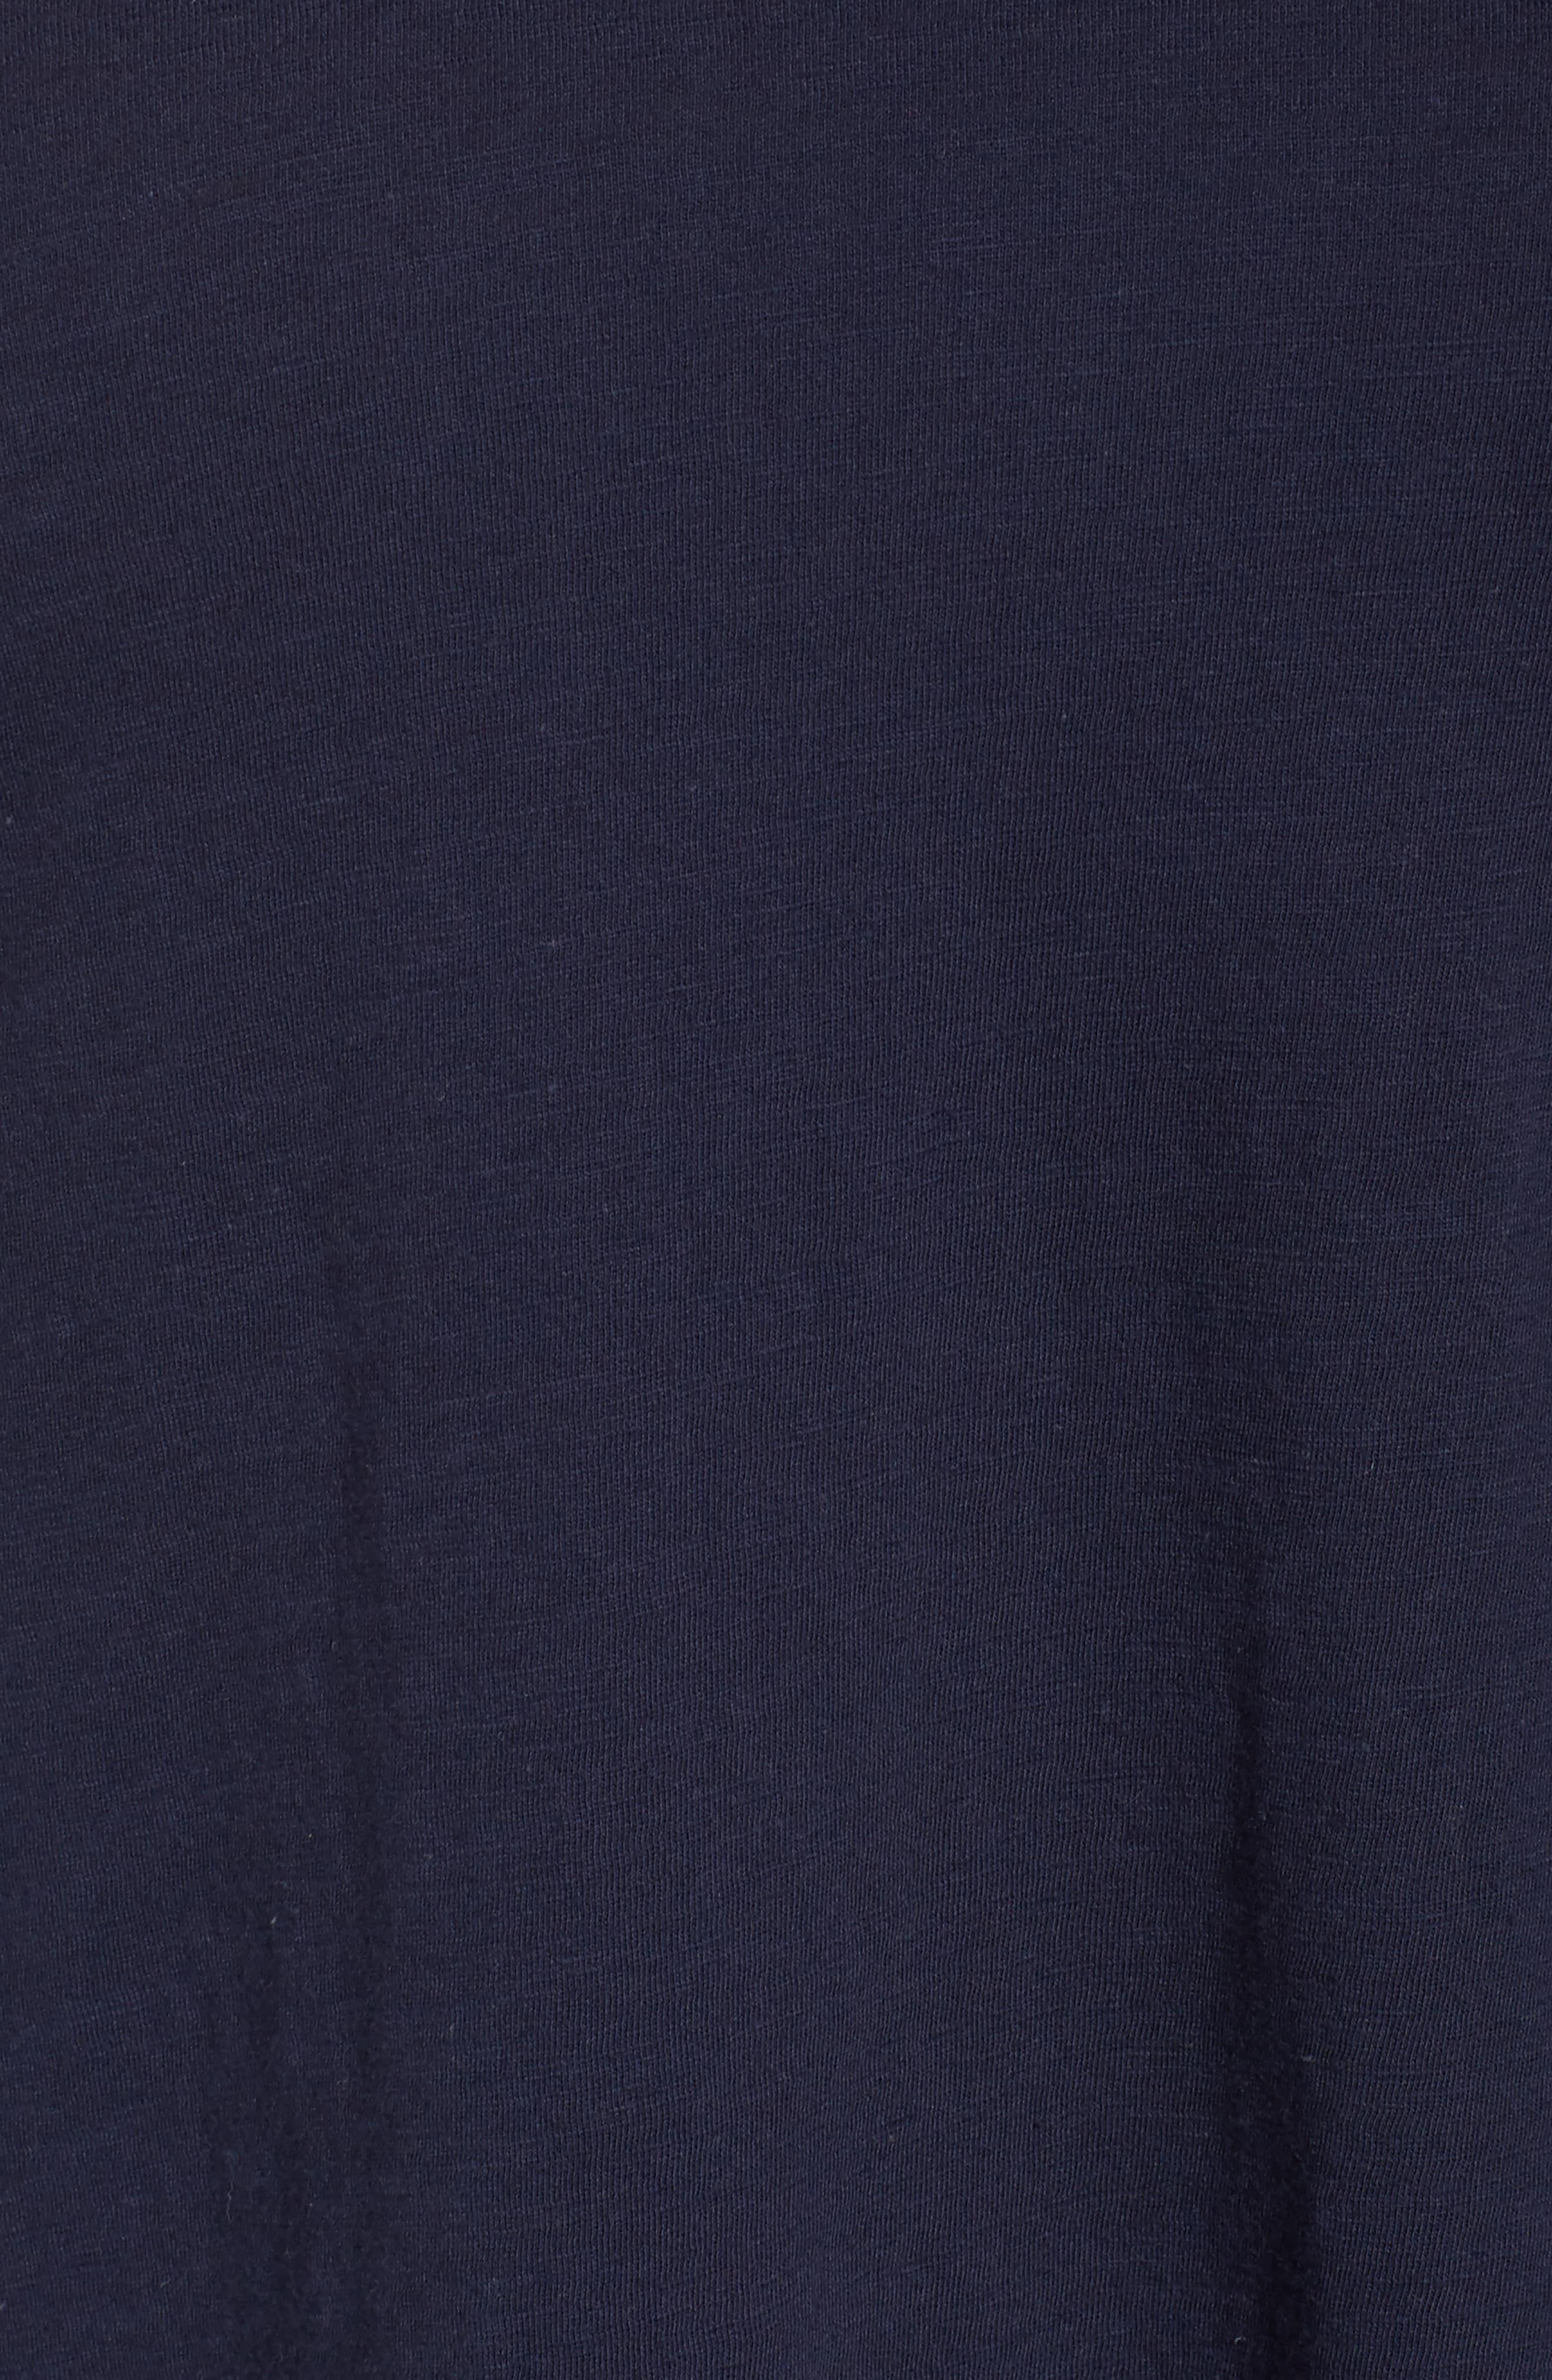 Organic Cotton V-Neck Top,                             Alternate thumbnail 34, color,